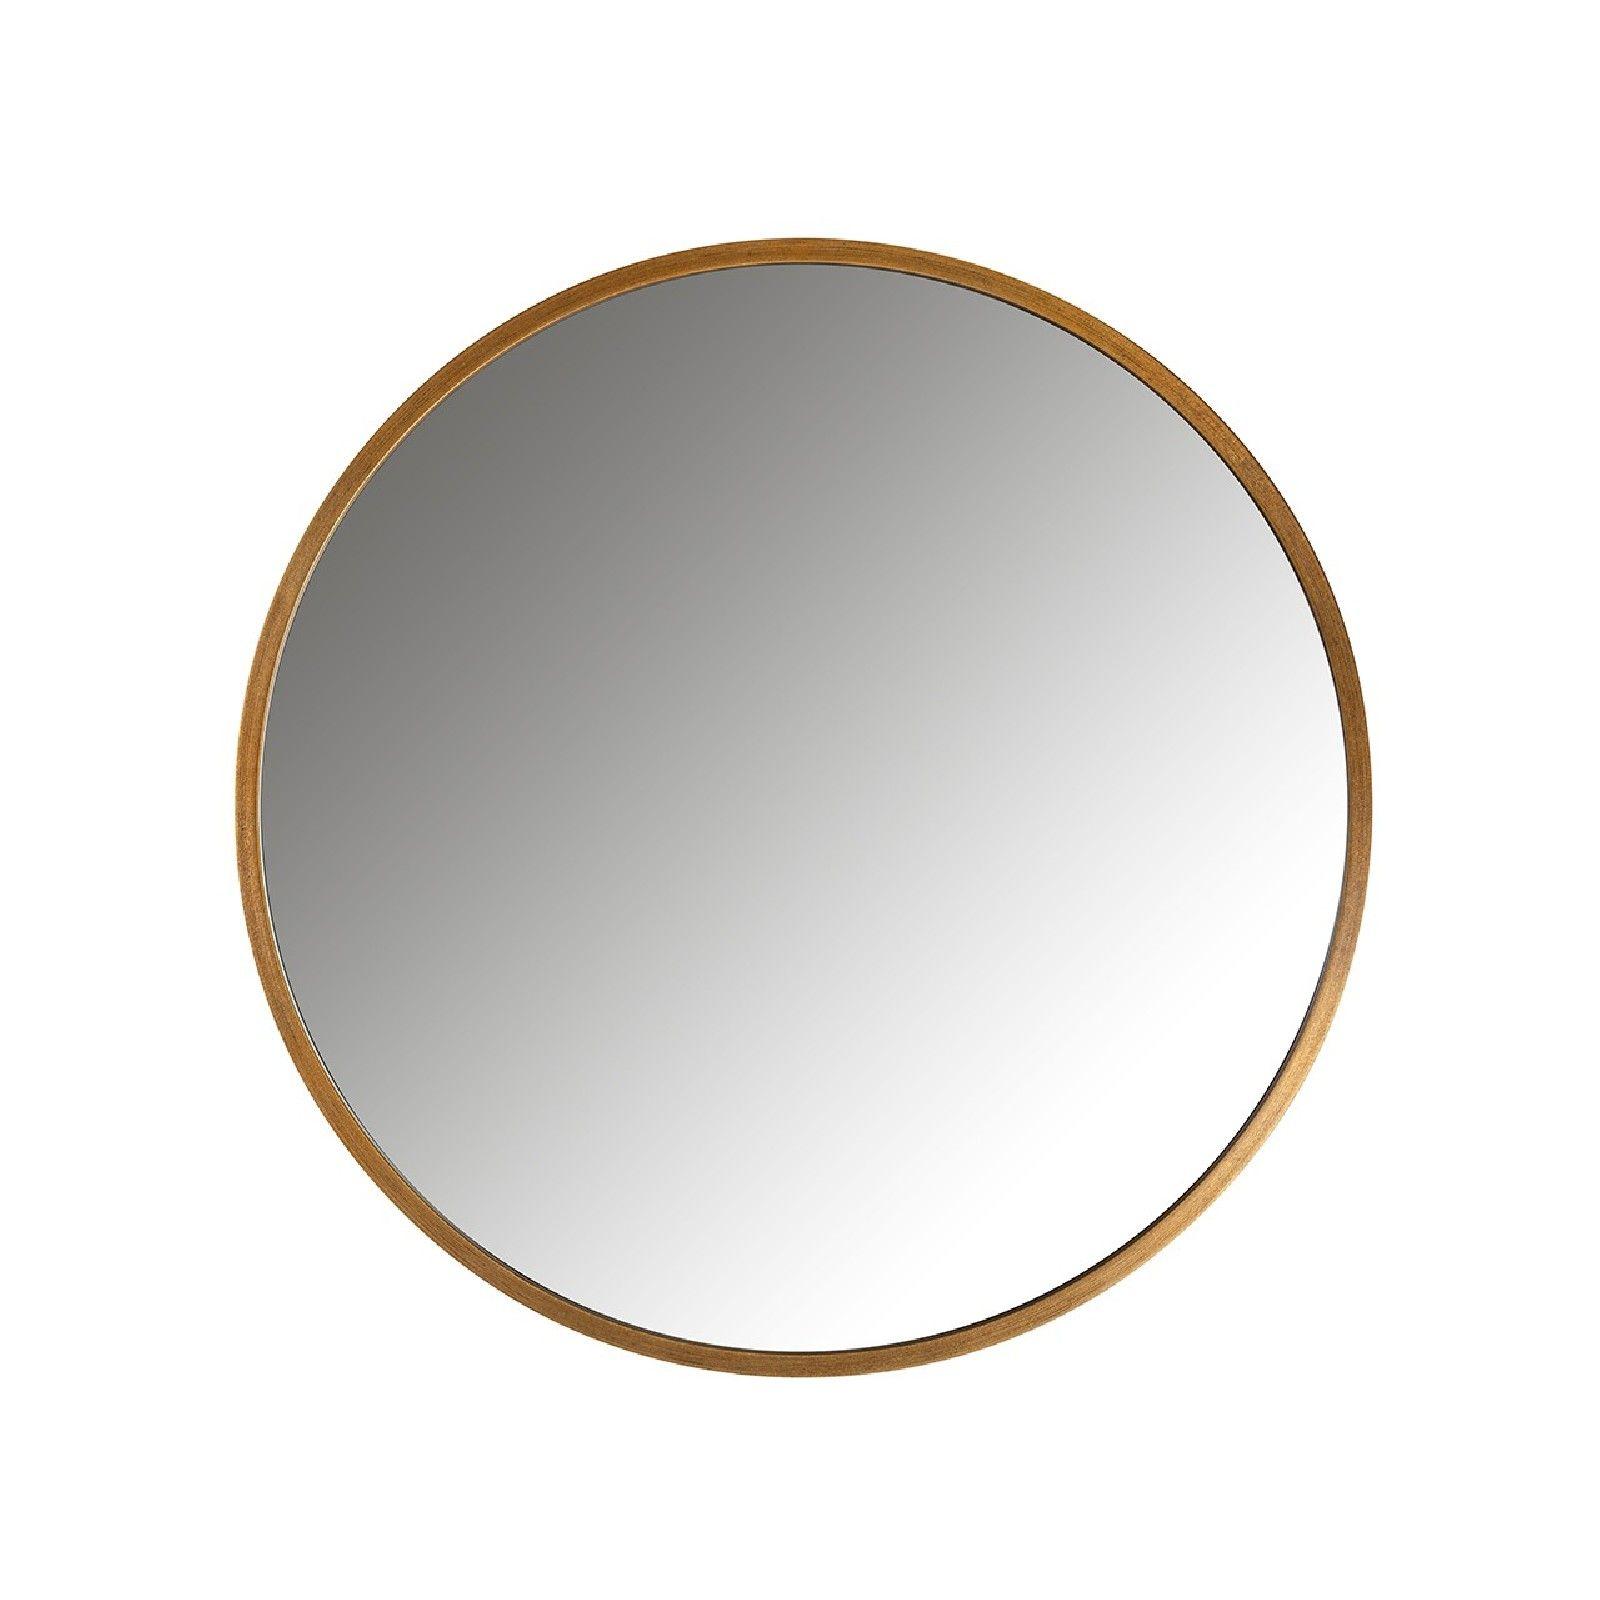 Miroir Maeron doré 70Ø Miroirs décoratifs - 19